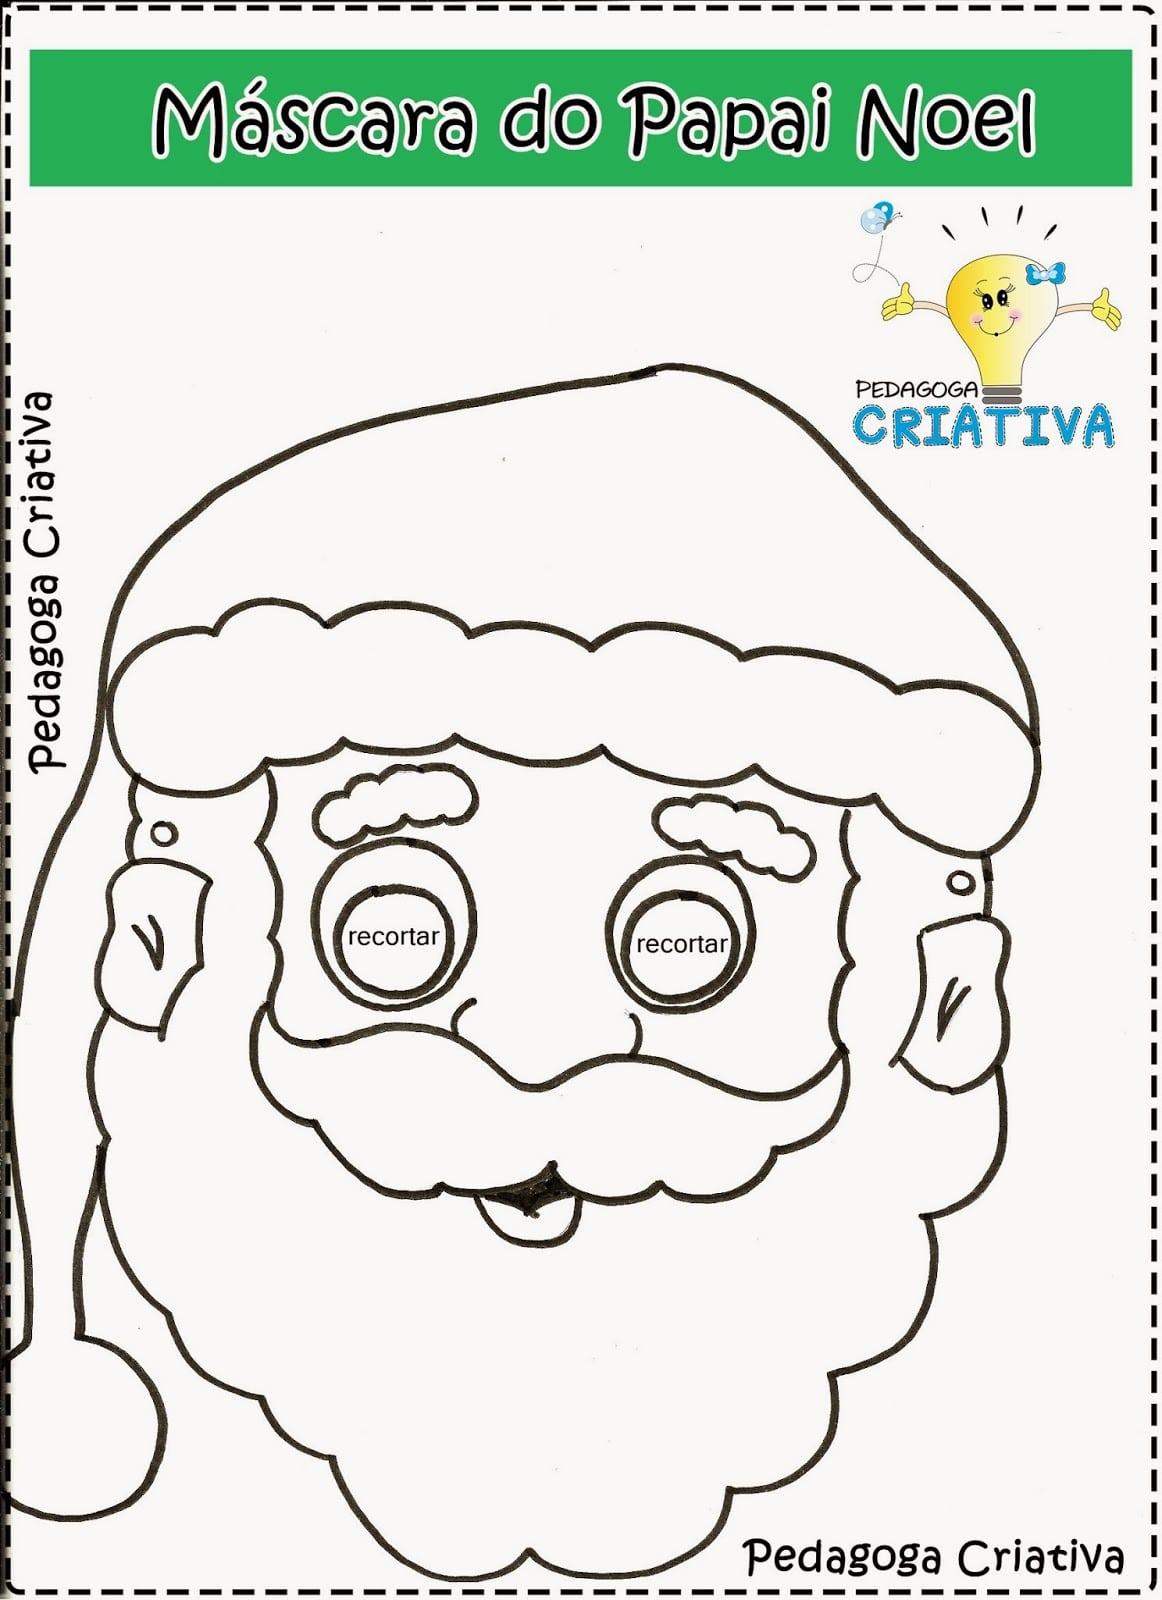 Pedagoga Criativa  Máscara Do Papai Noel Para Imprimir